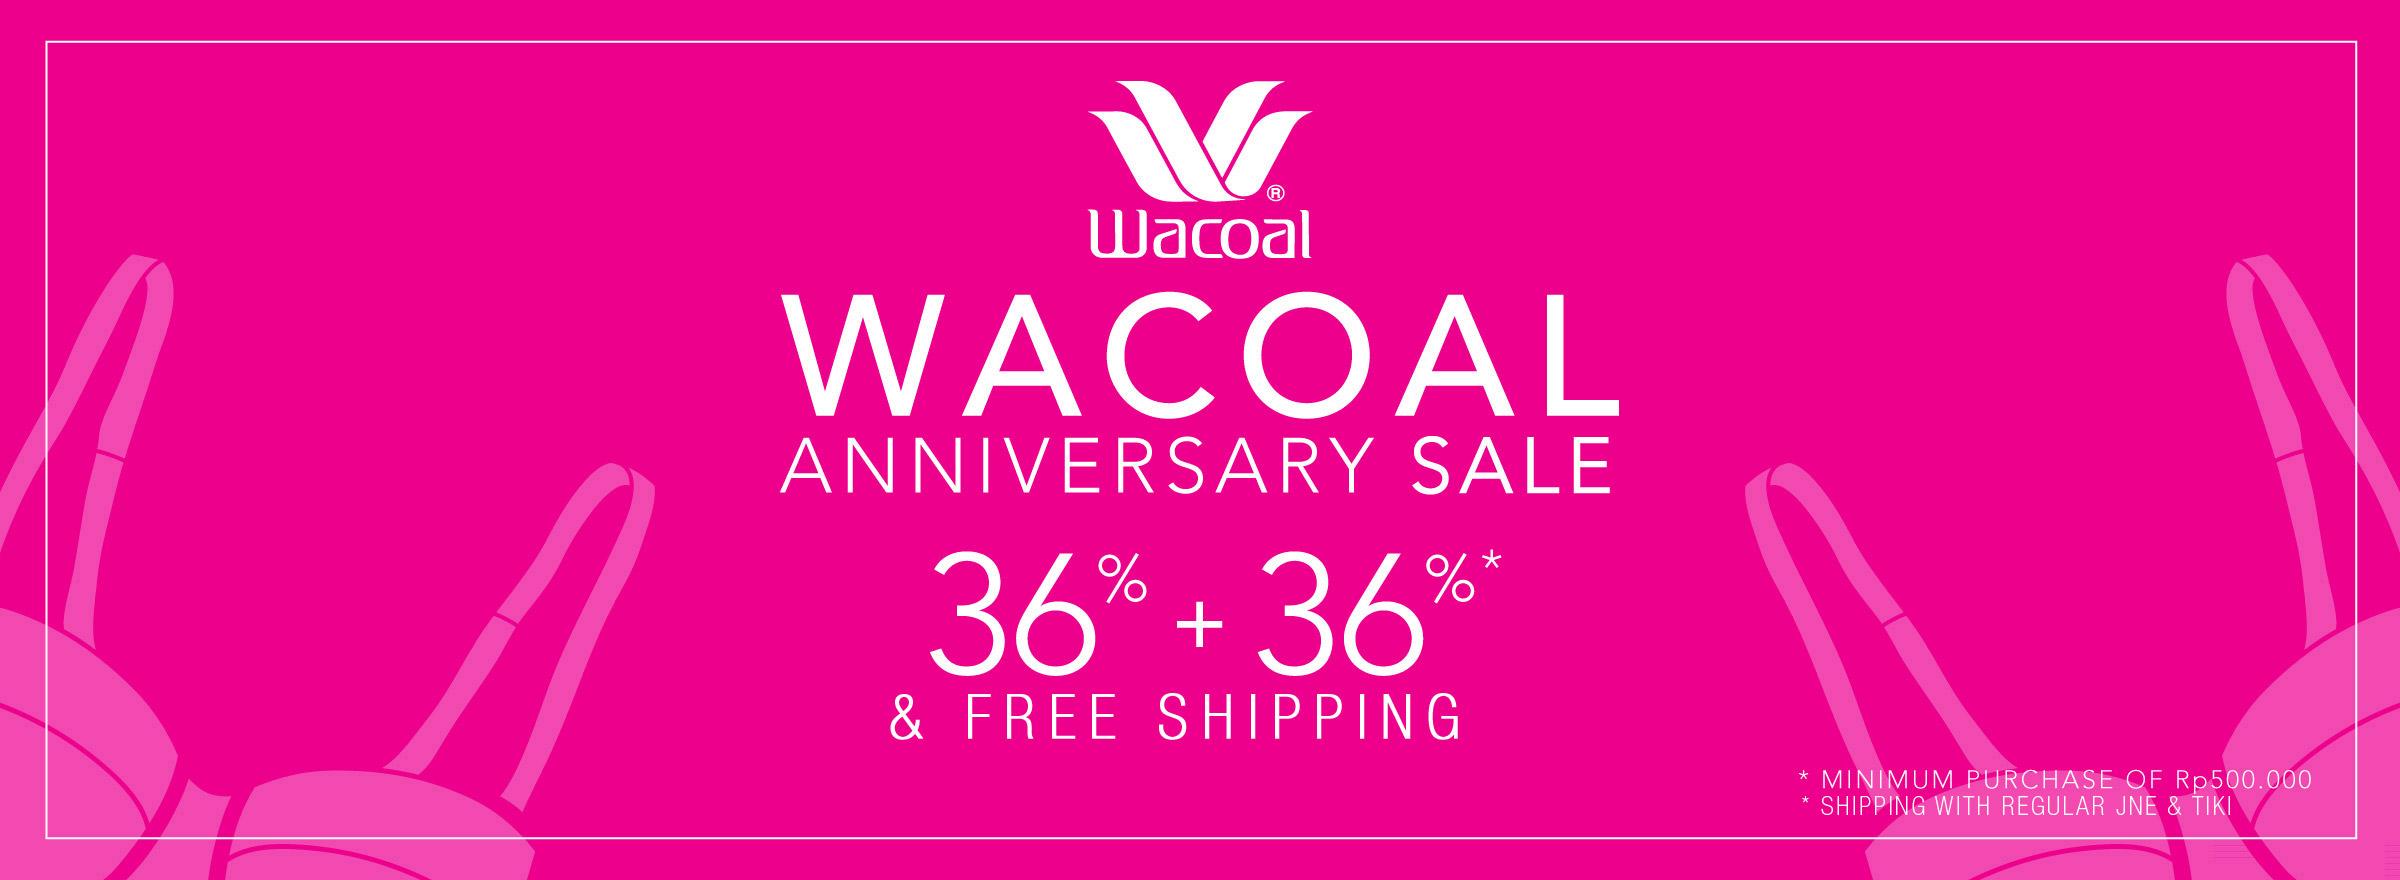 Wacoal Anniversary36